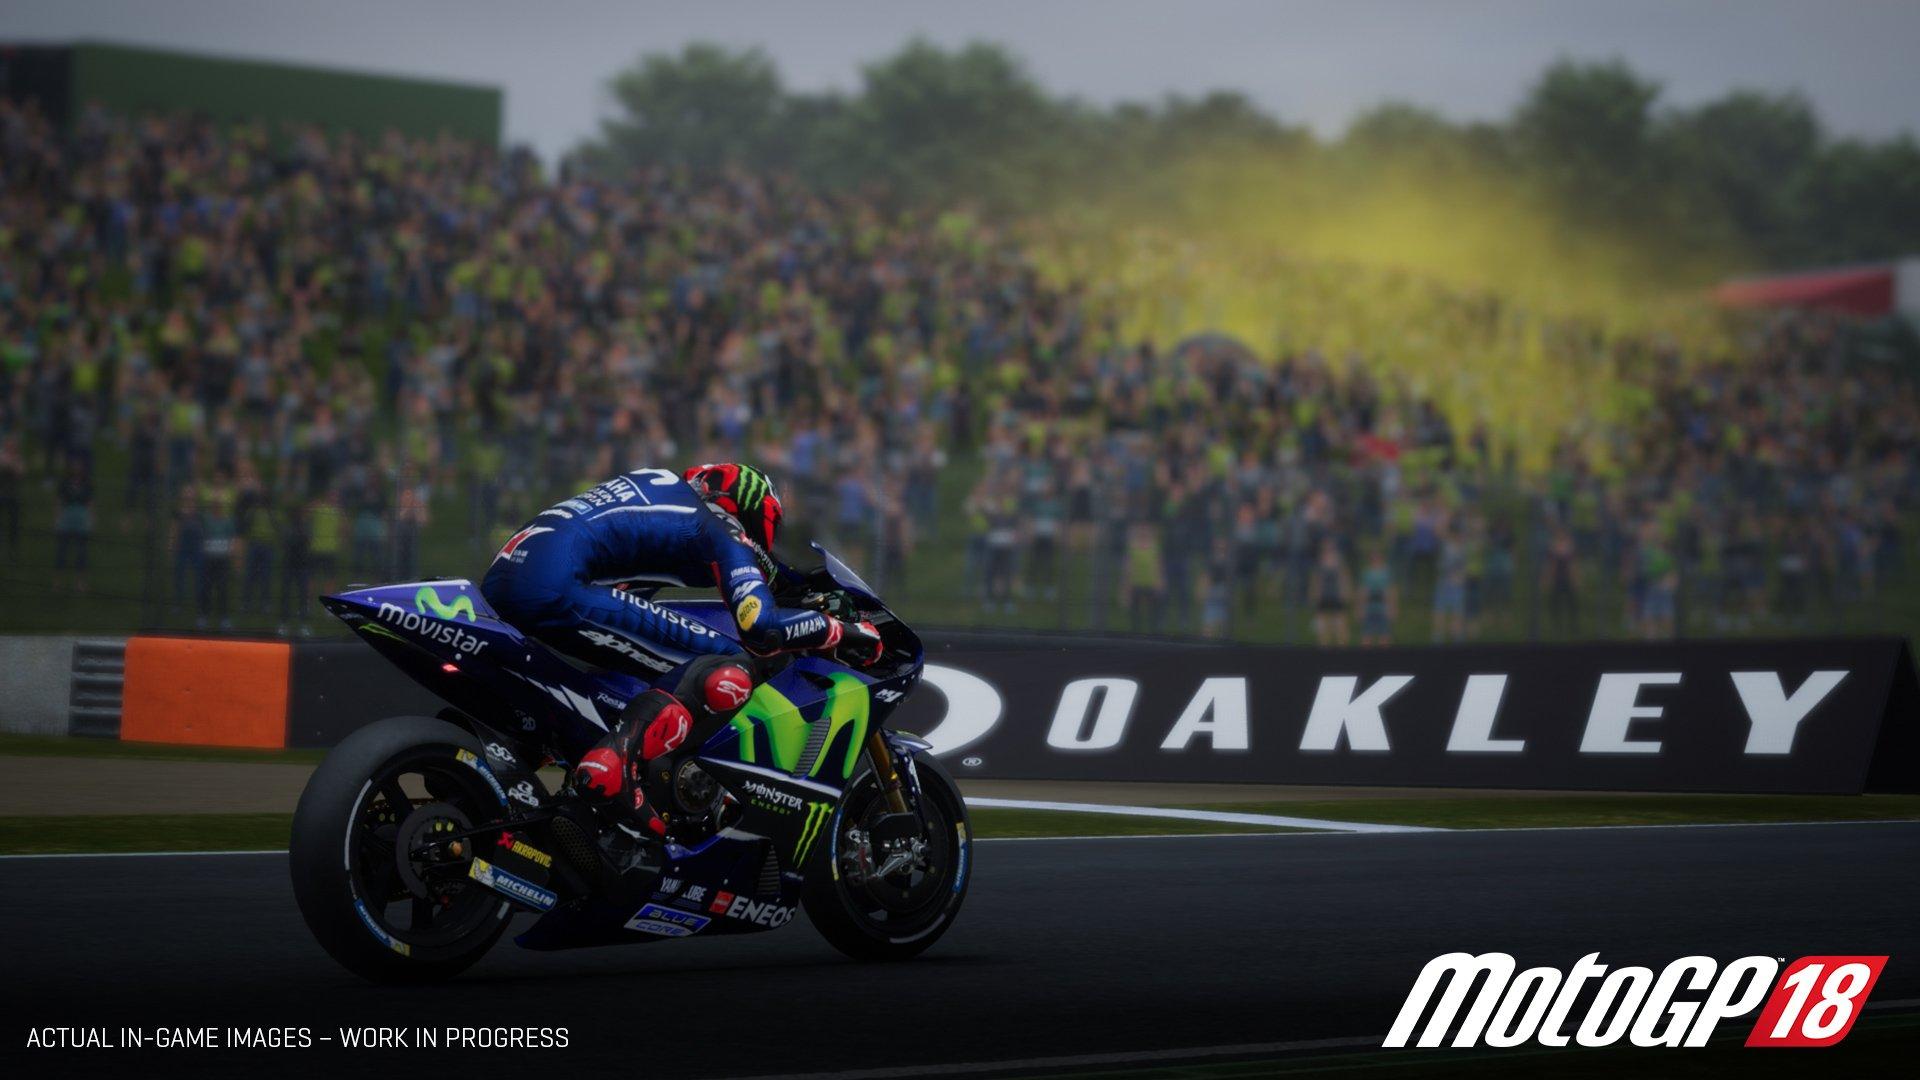 MotoGP 18 preview 11